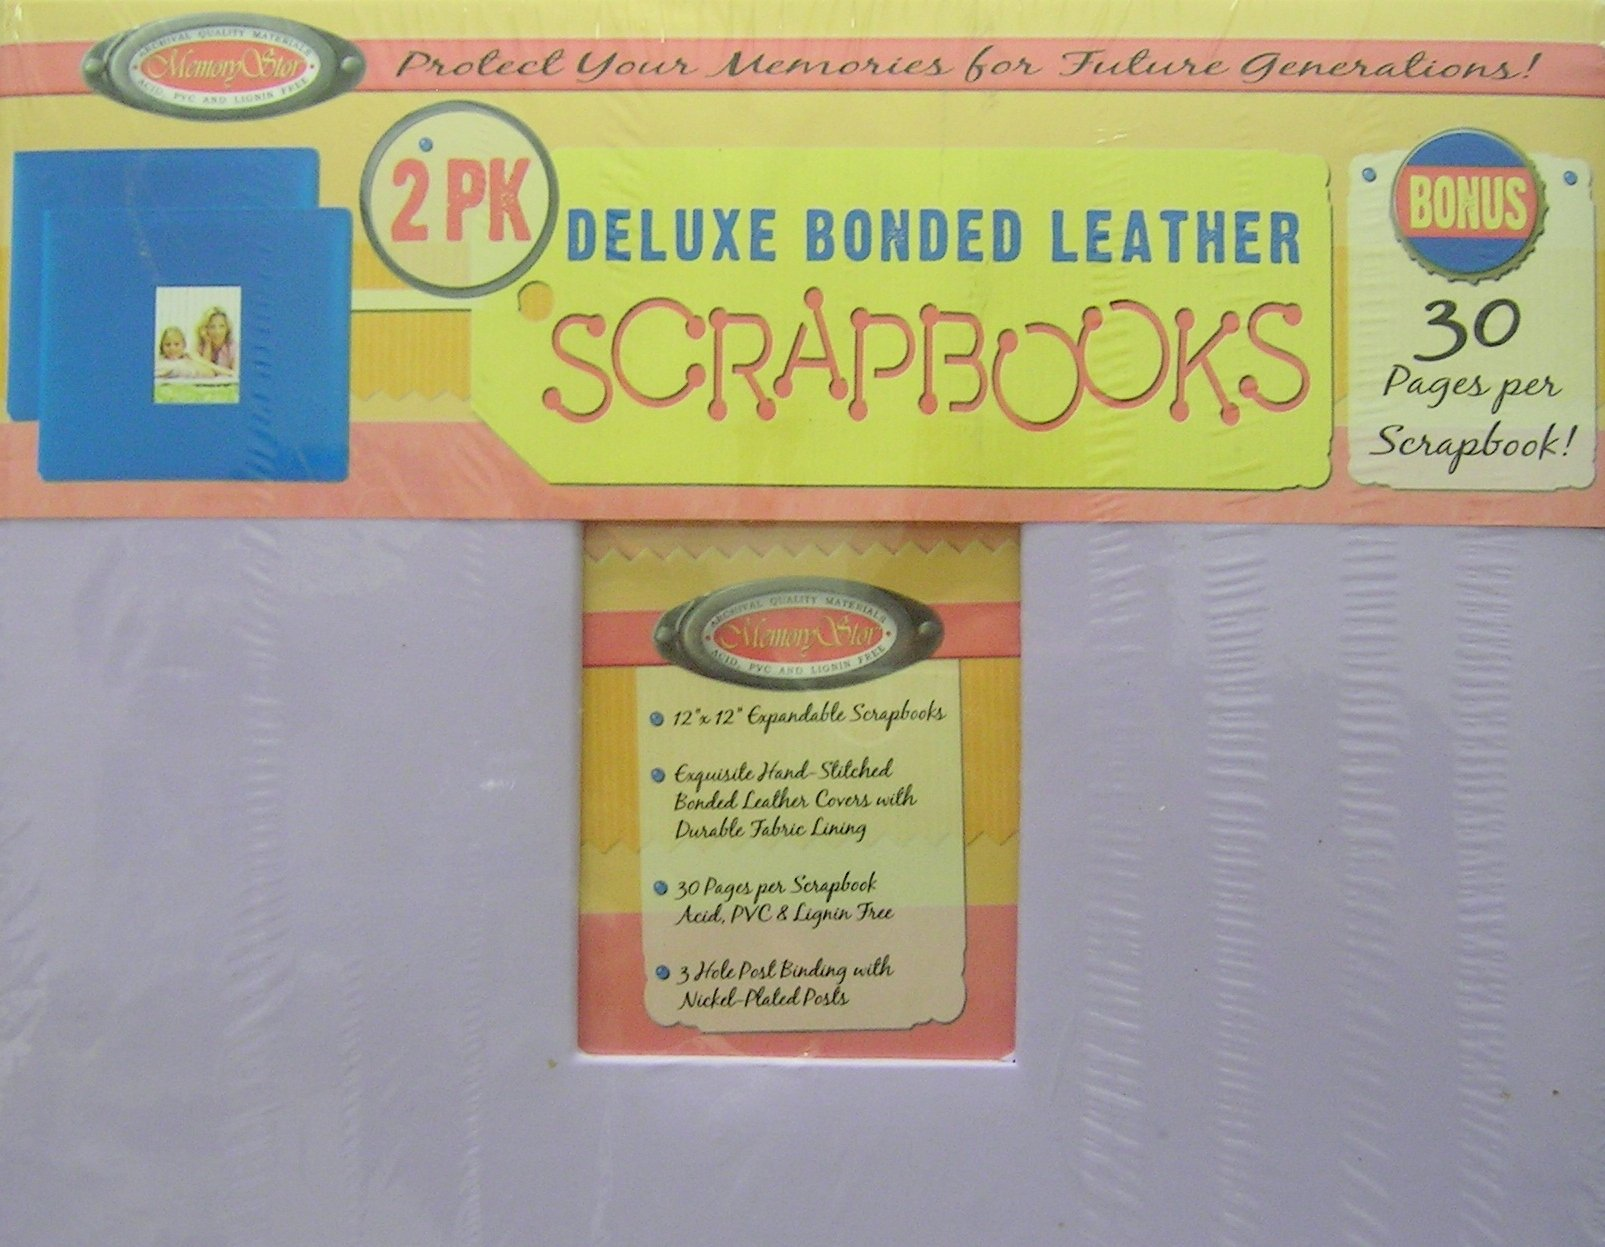 Memory Stor 2pk Deluxe Bonded Leather Scrapbook